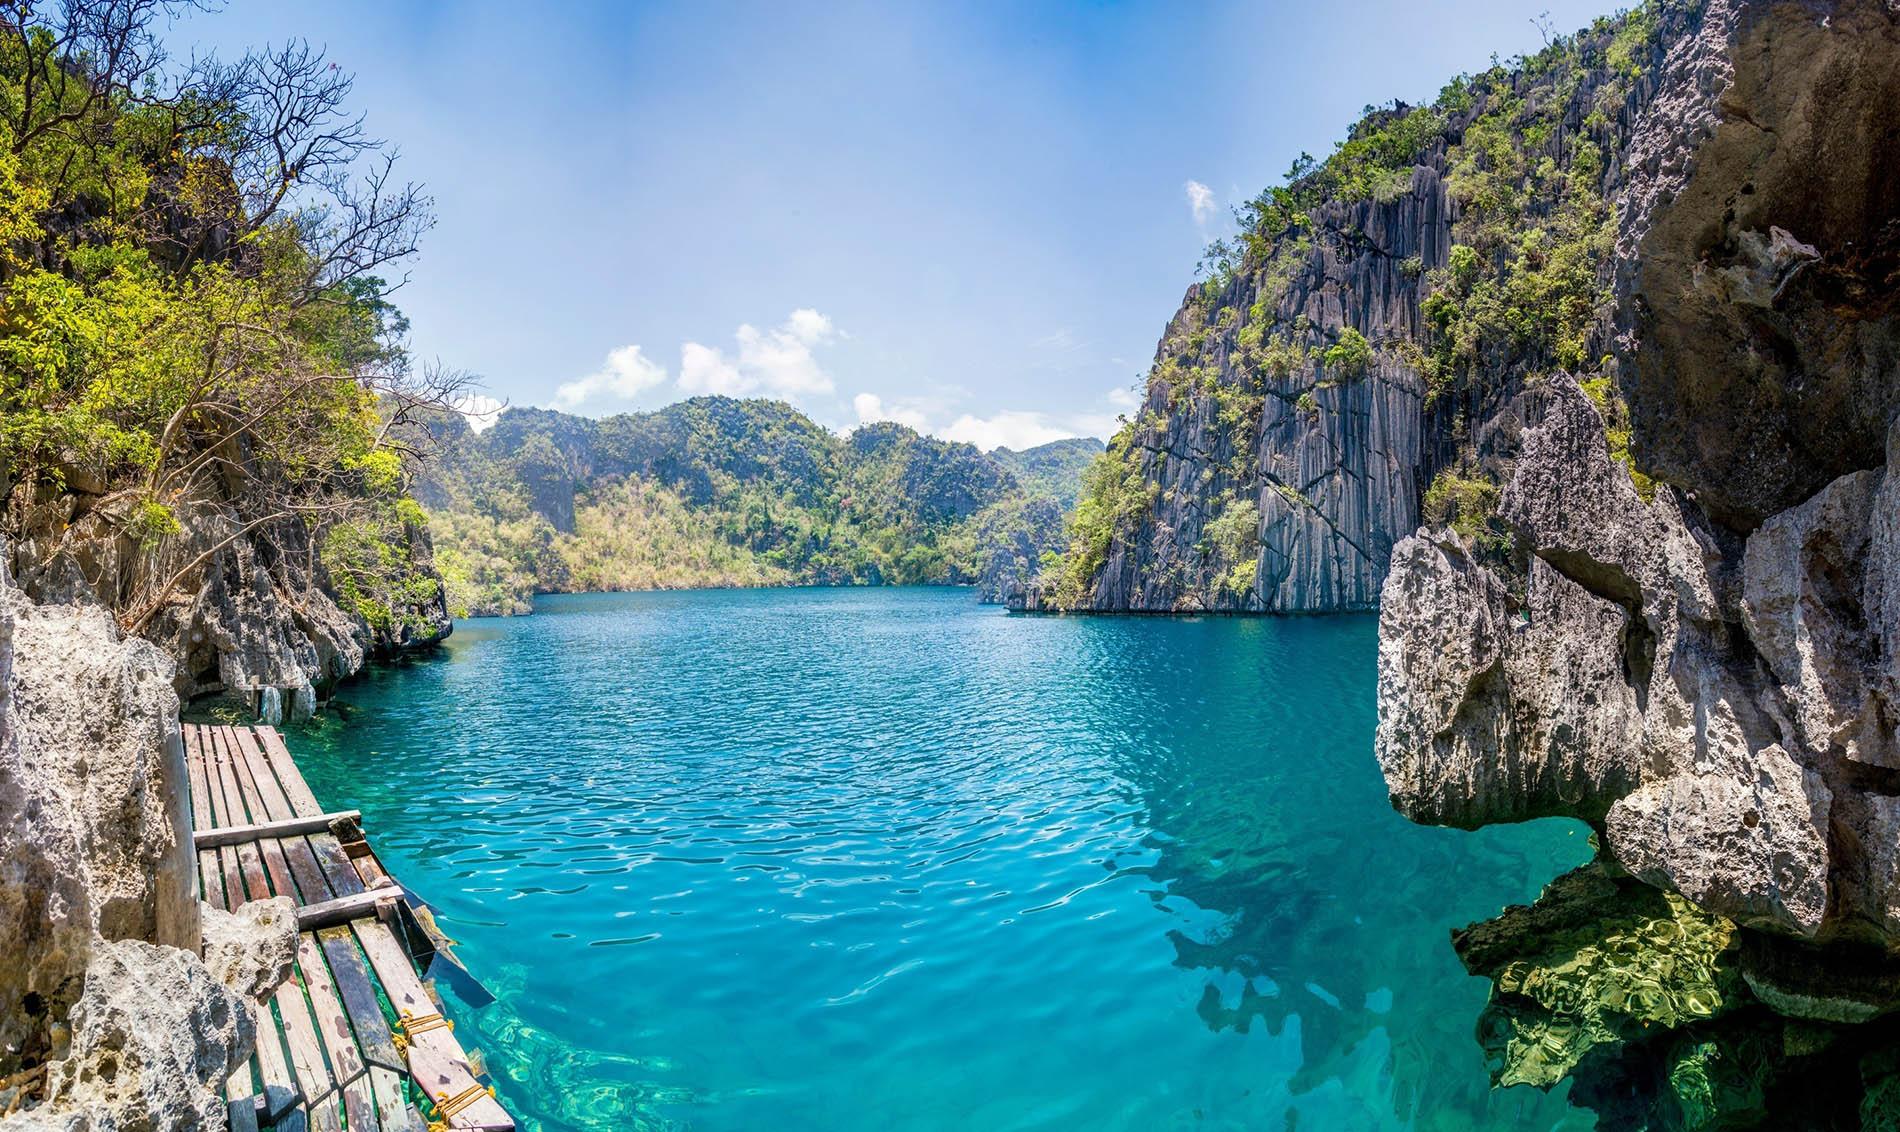 Озеро Барракуда, остров Корон на Филиппинах